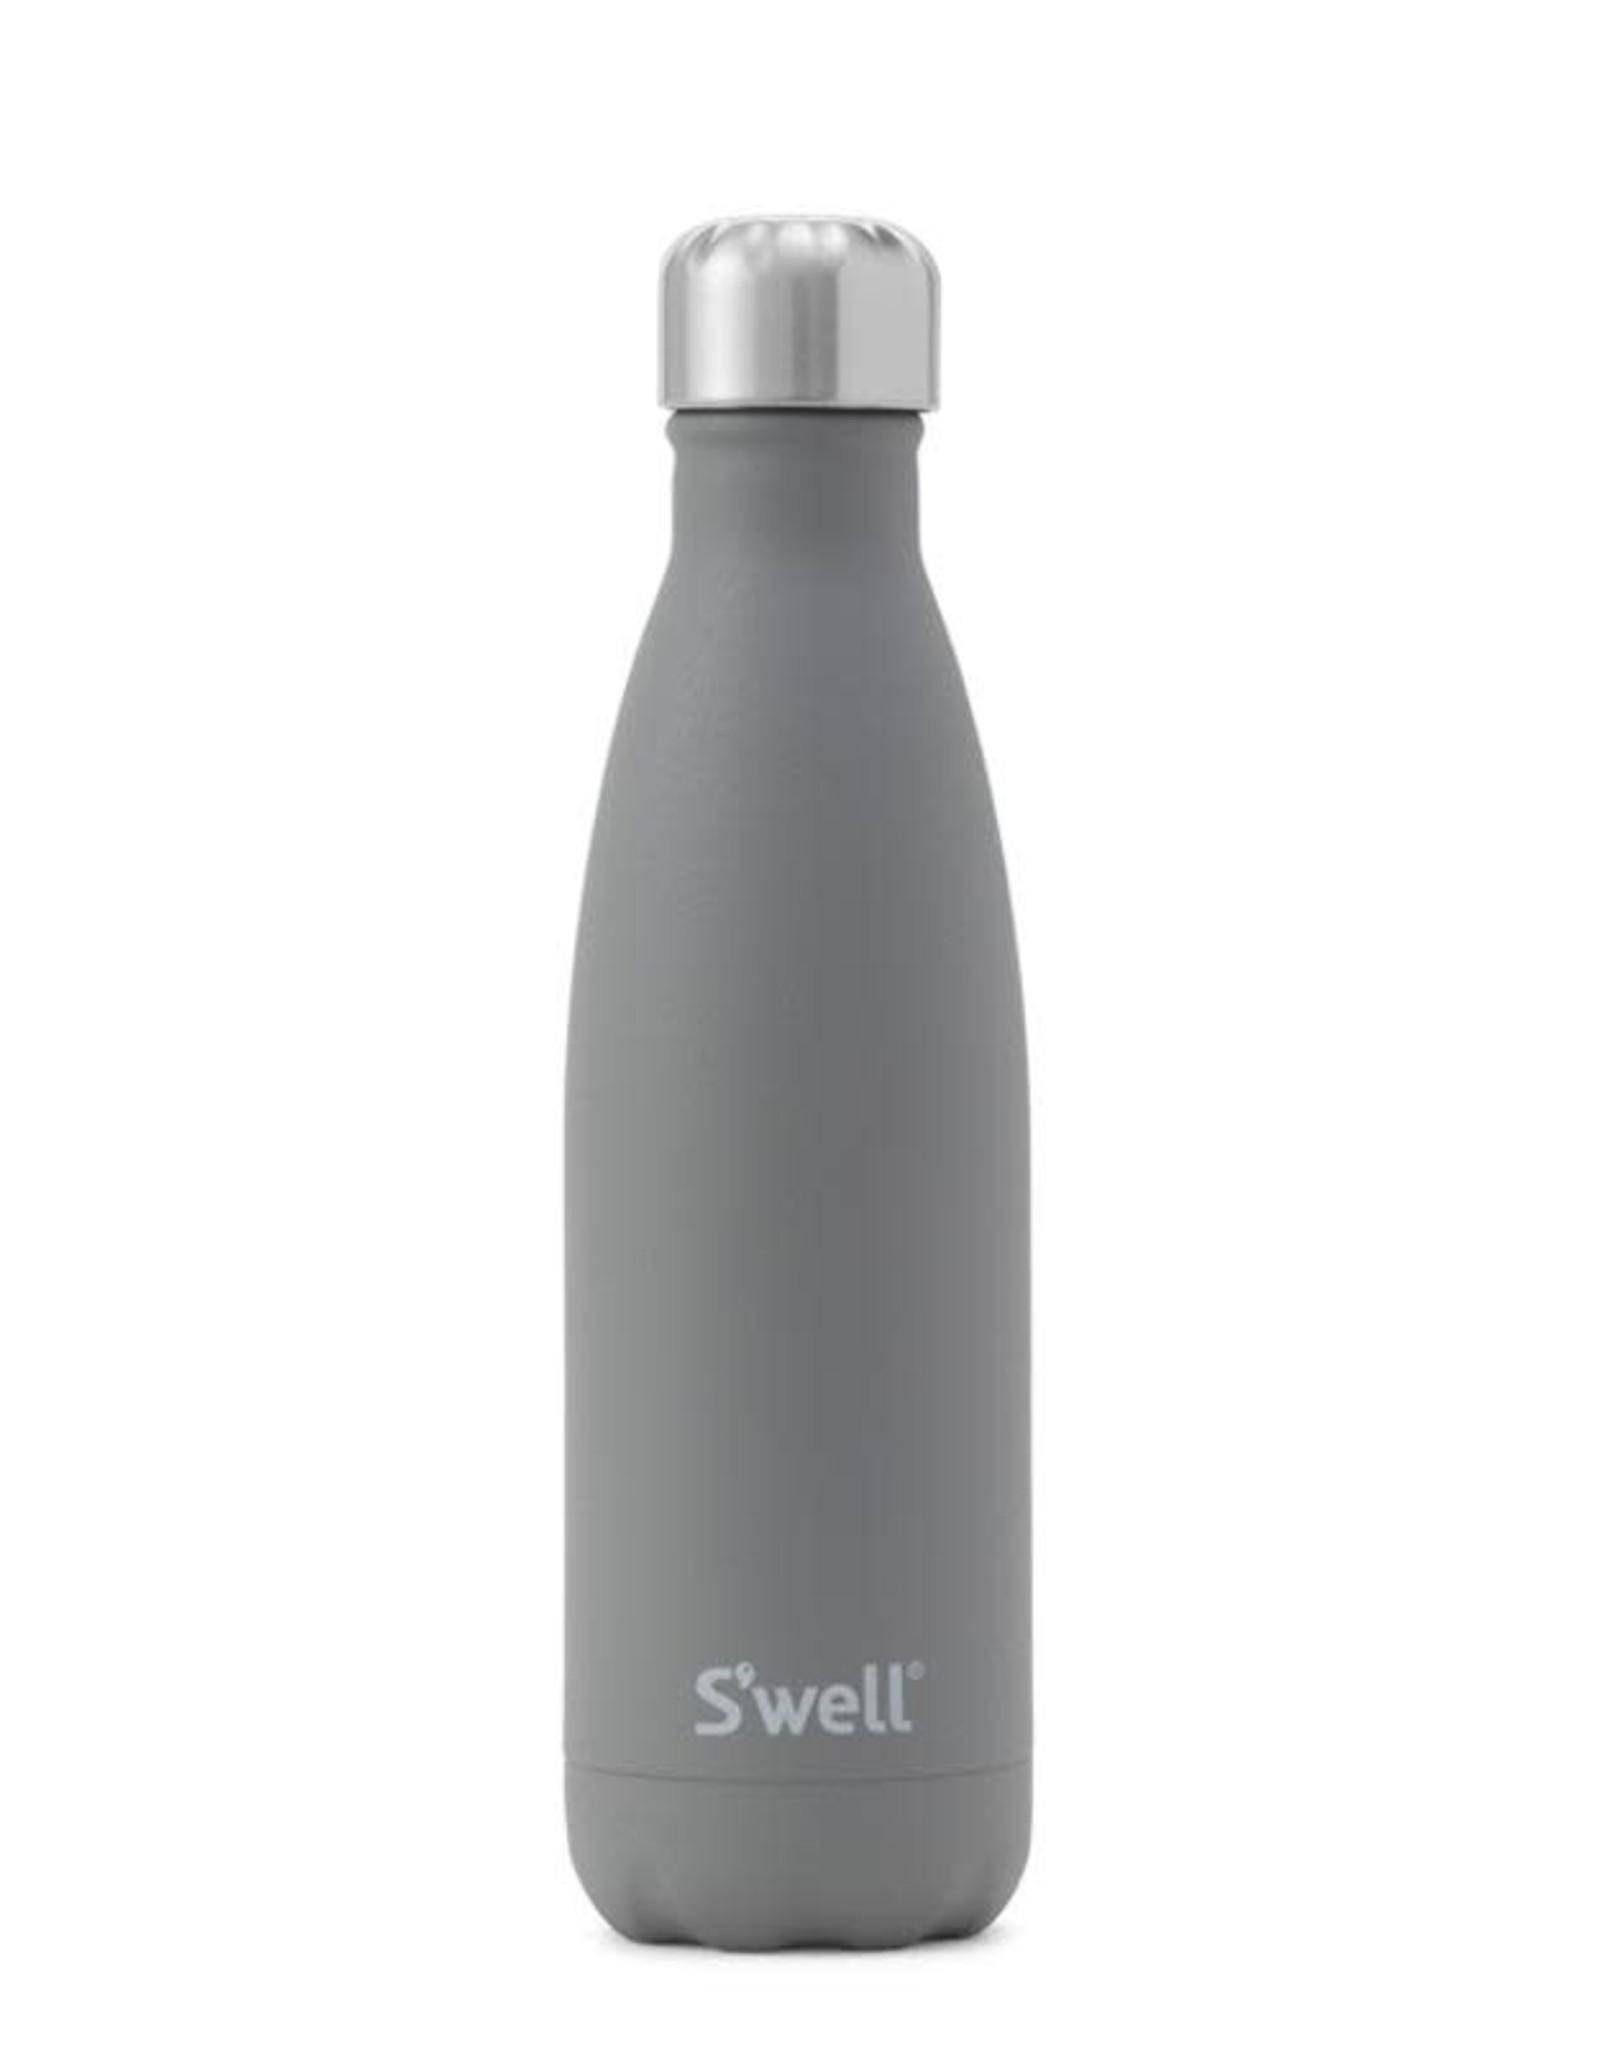 S'well 17oz bottle